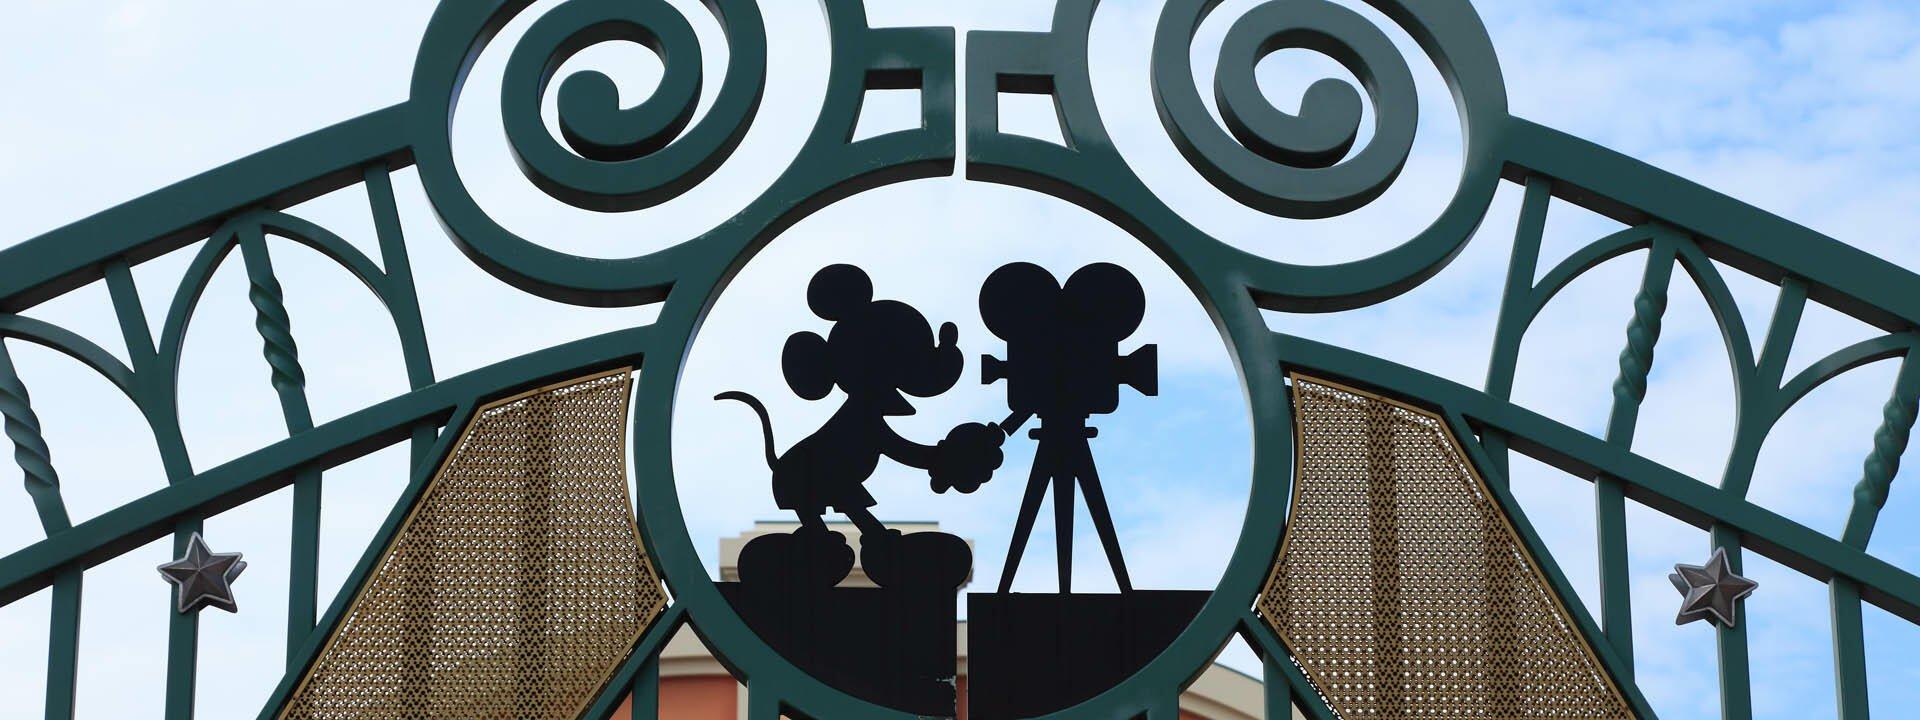 Discover 3 amazing places to visit near Disneyland Paris